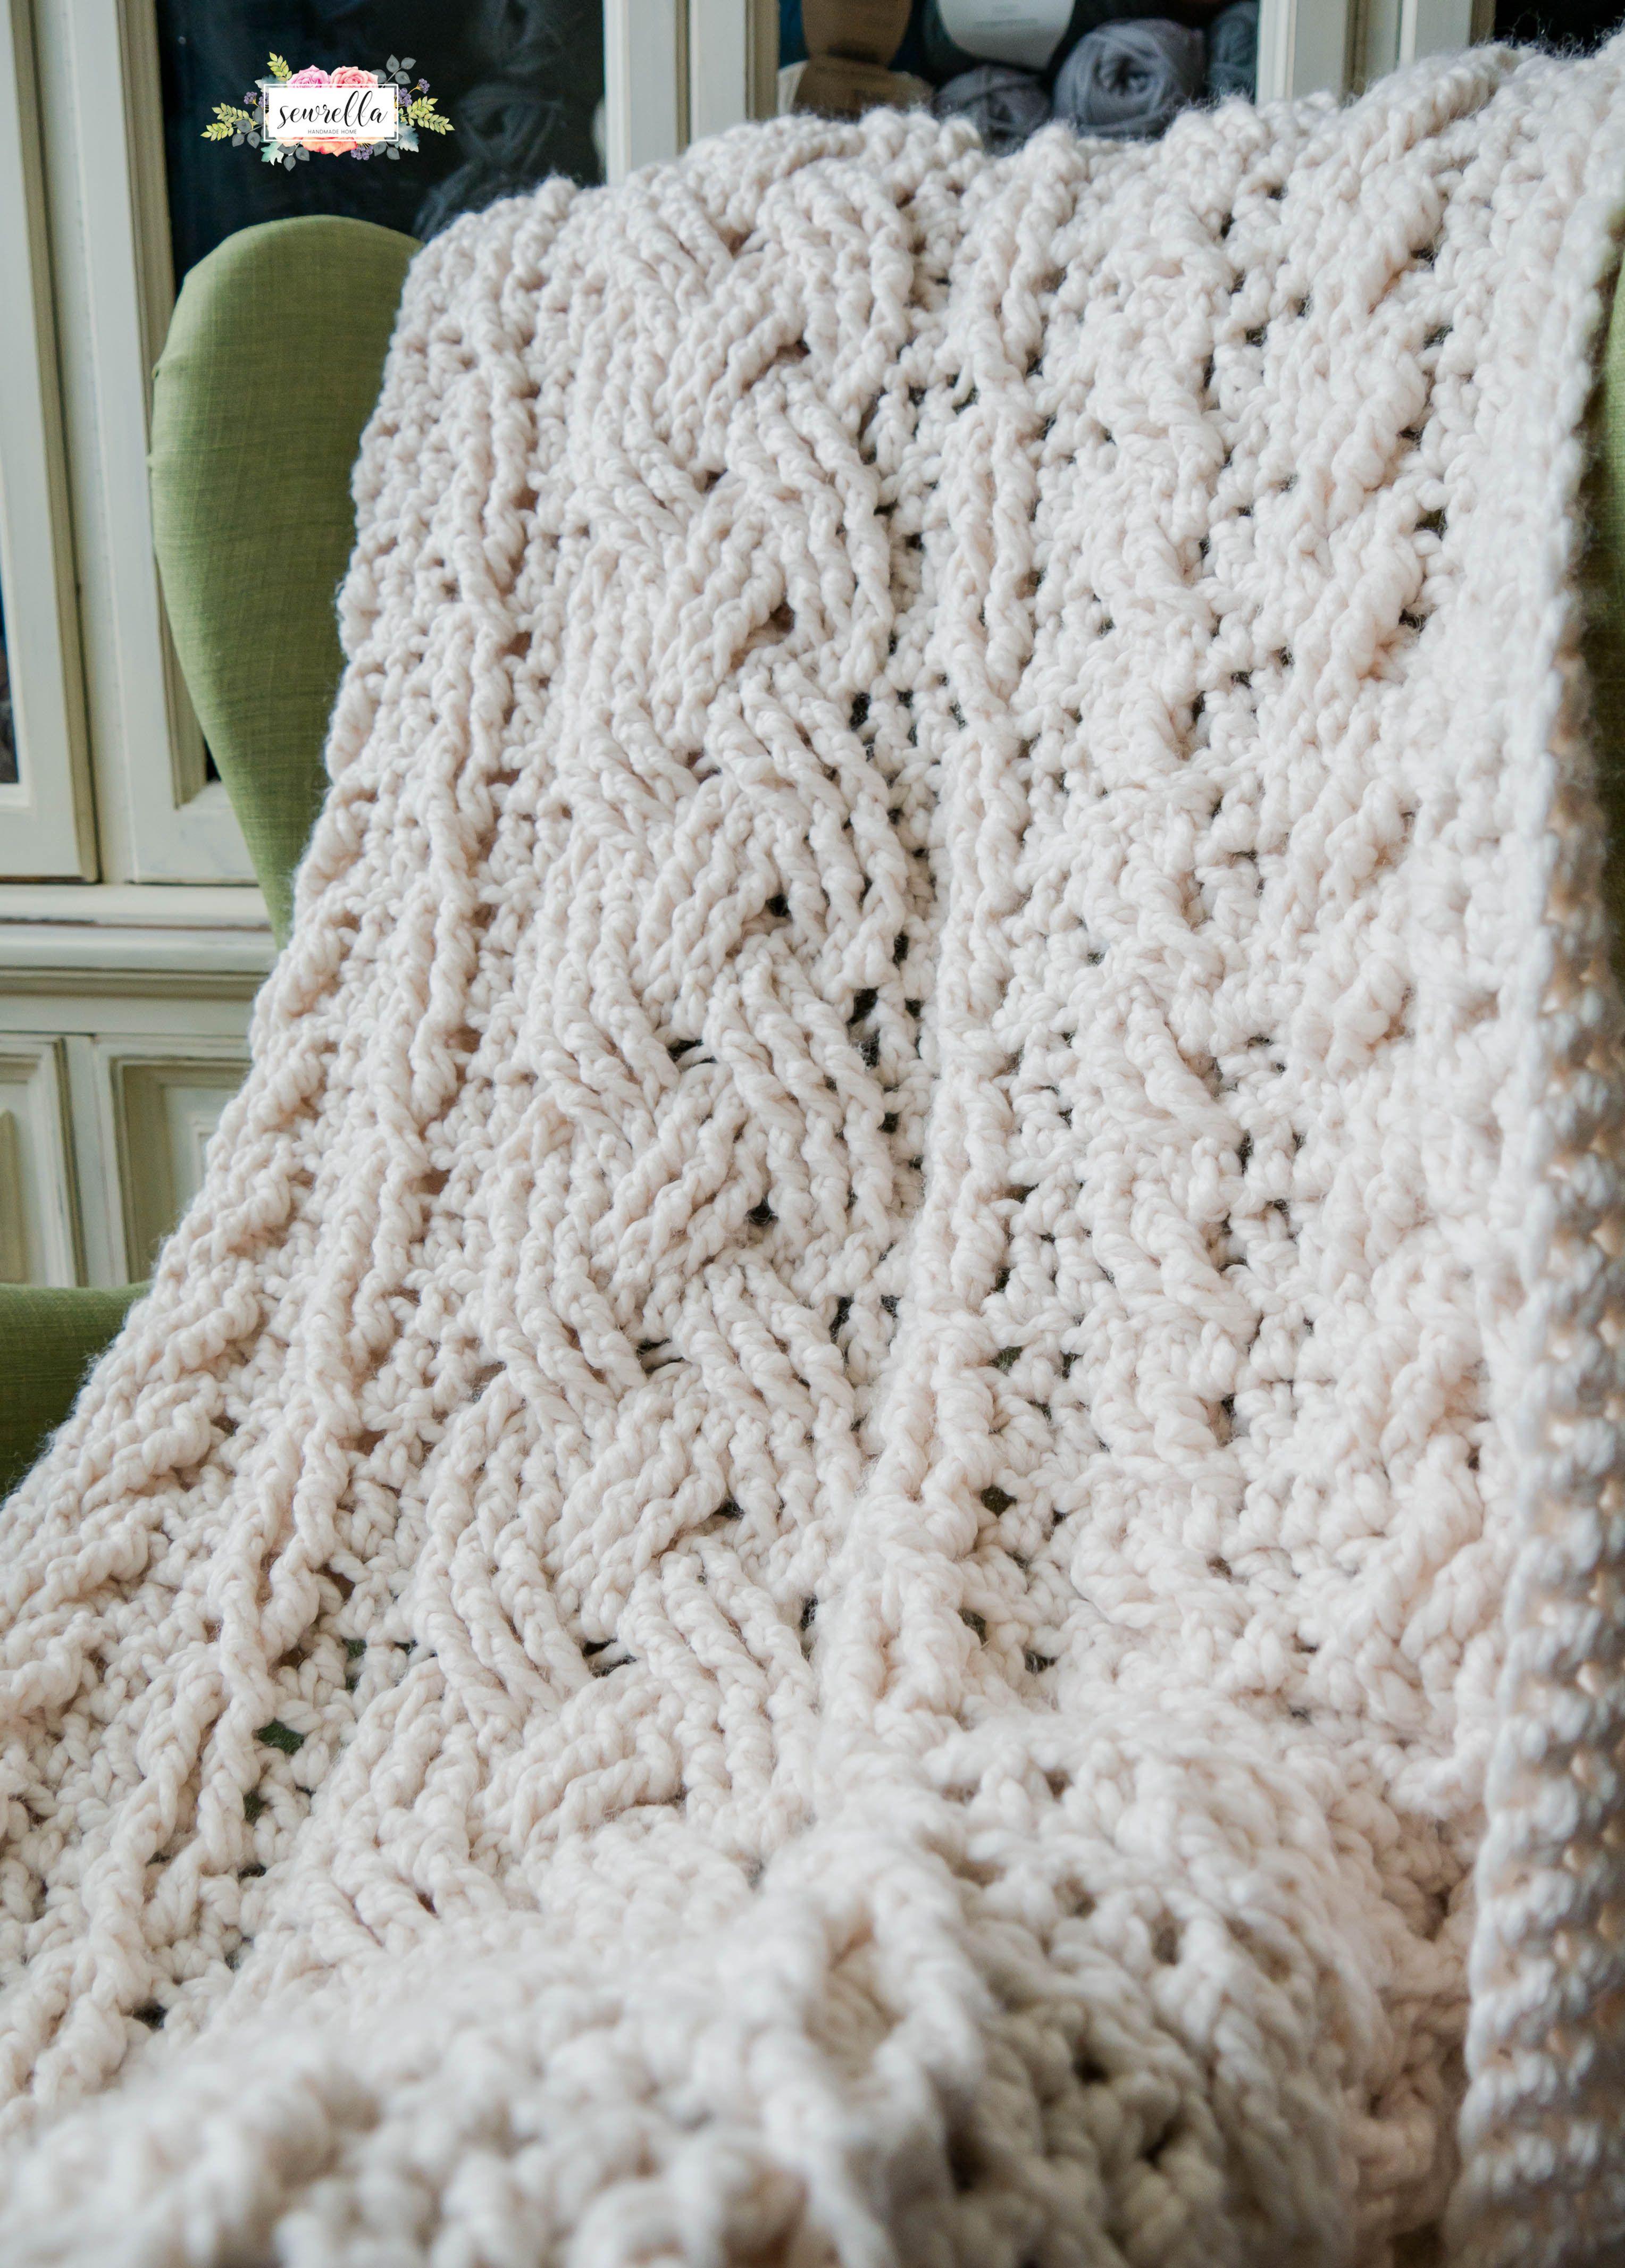 Crochet Heirloom Cabled Throw | oooo lala crochet | Pinterest